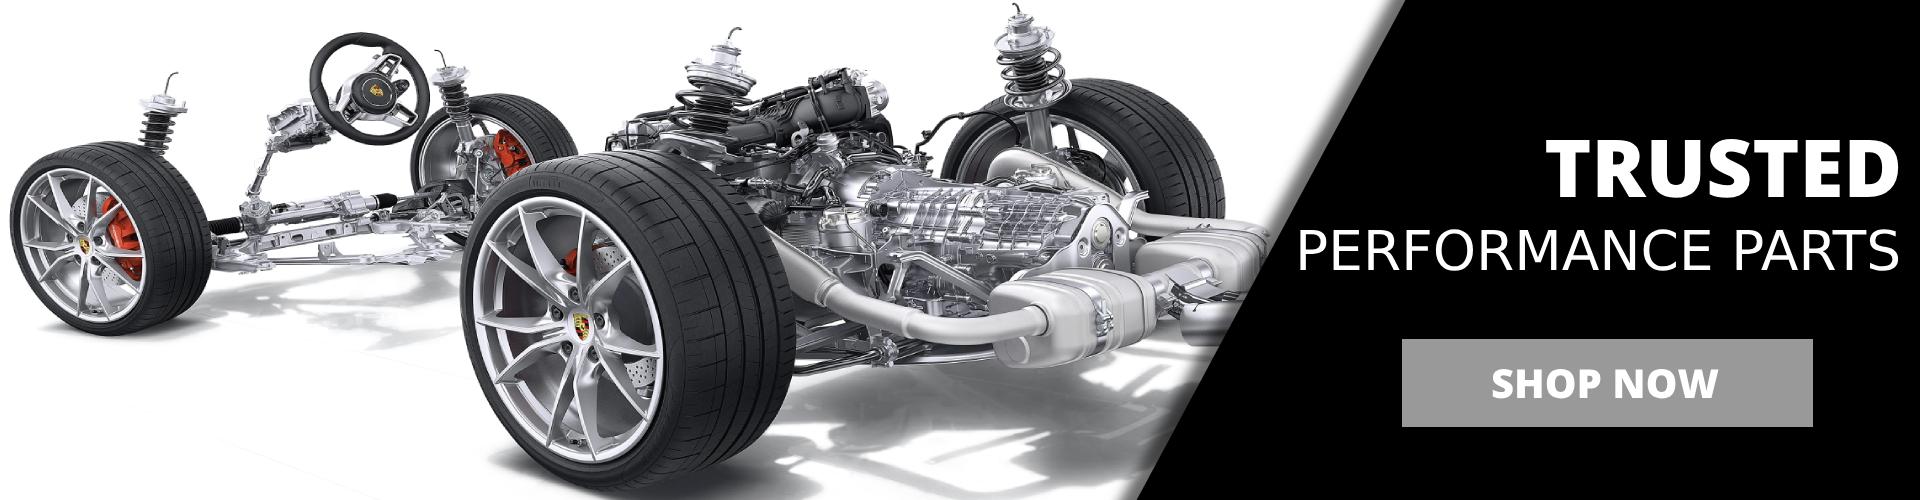 OEM Performance Parts